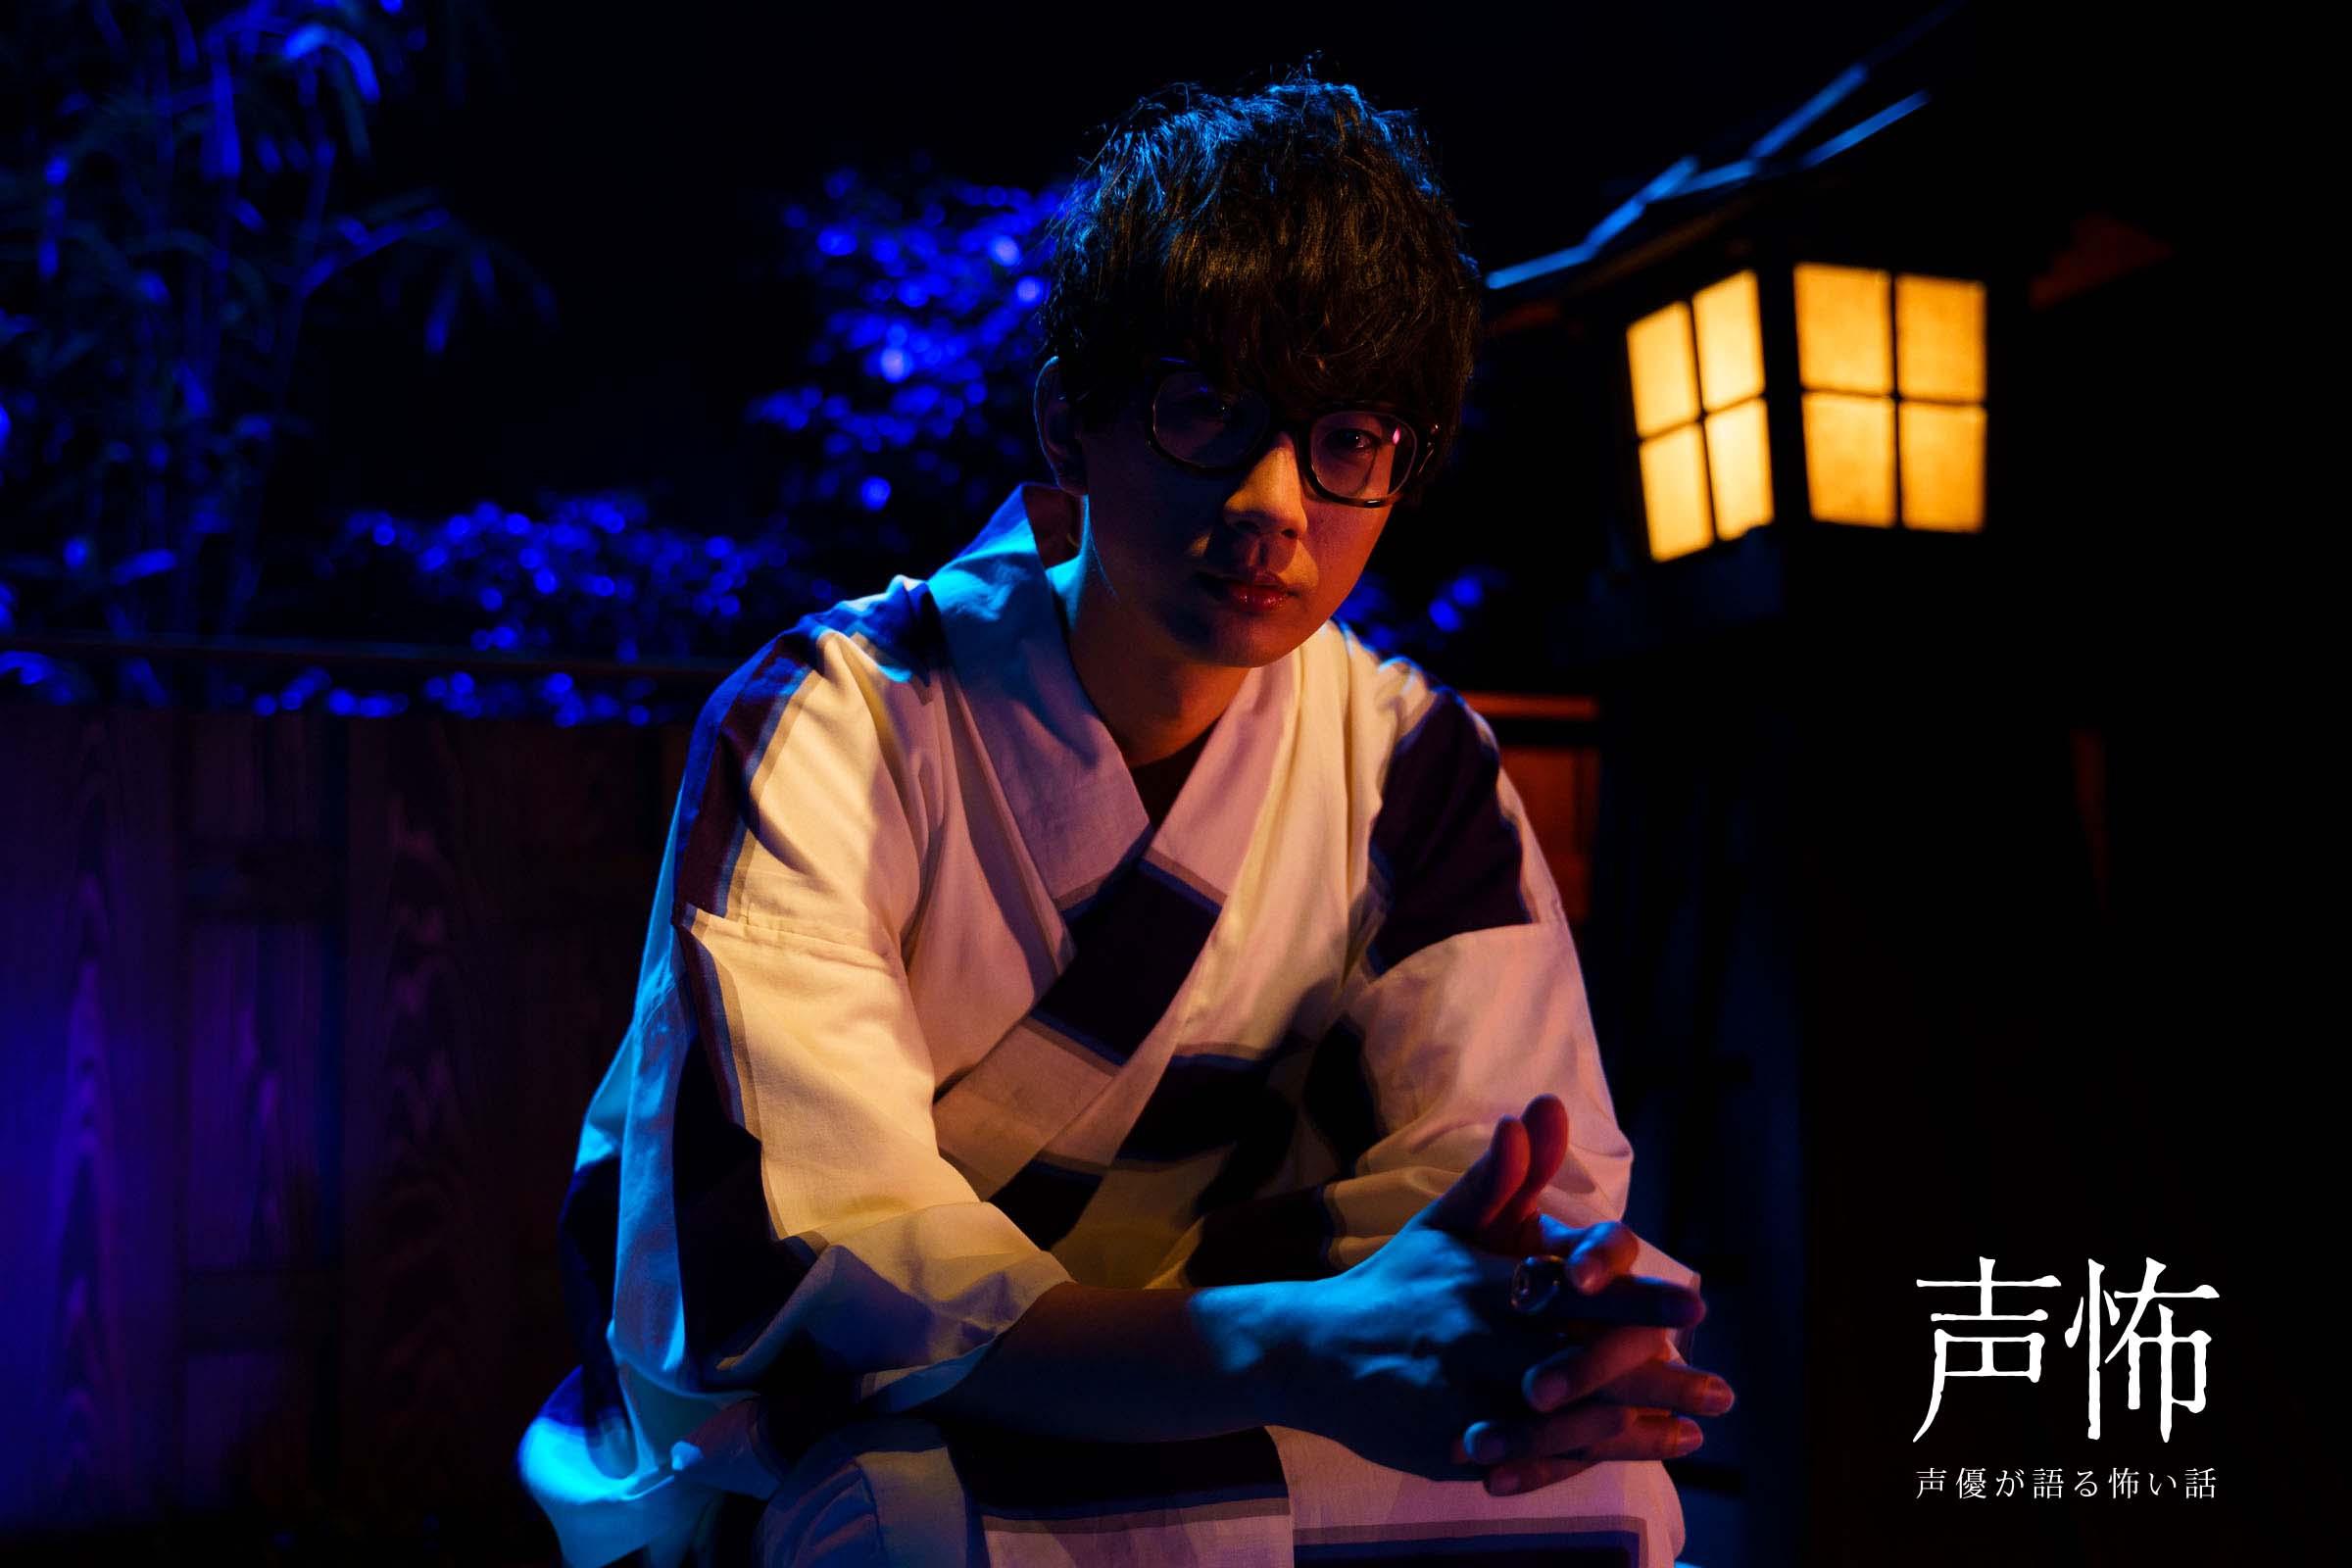 Takuya Eguchi Seikowa